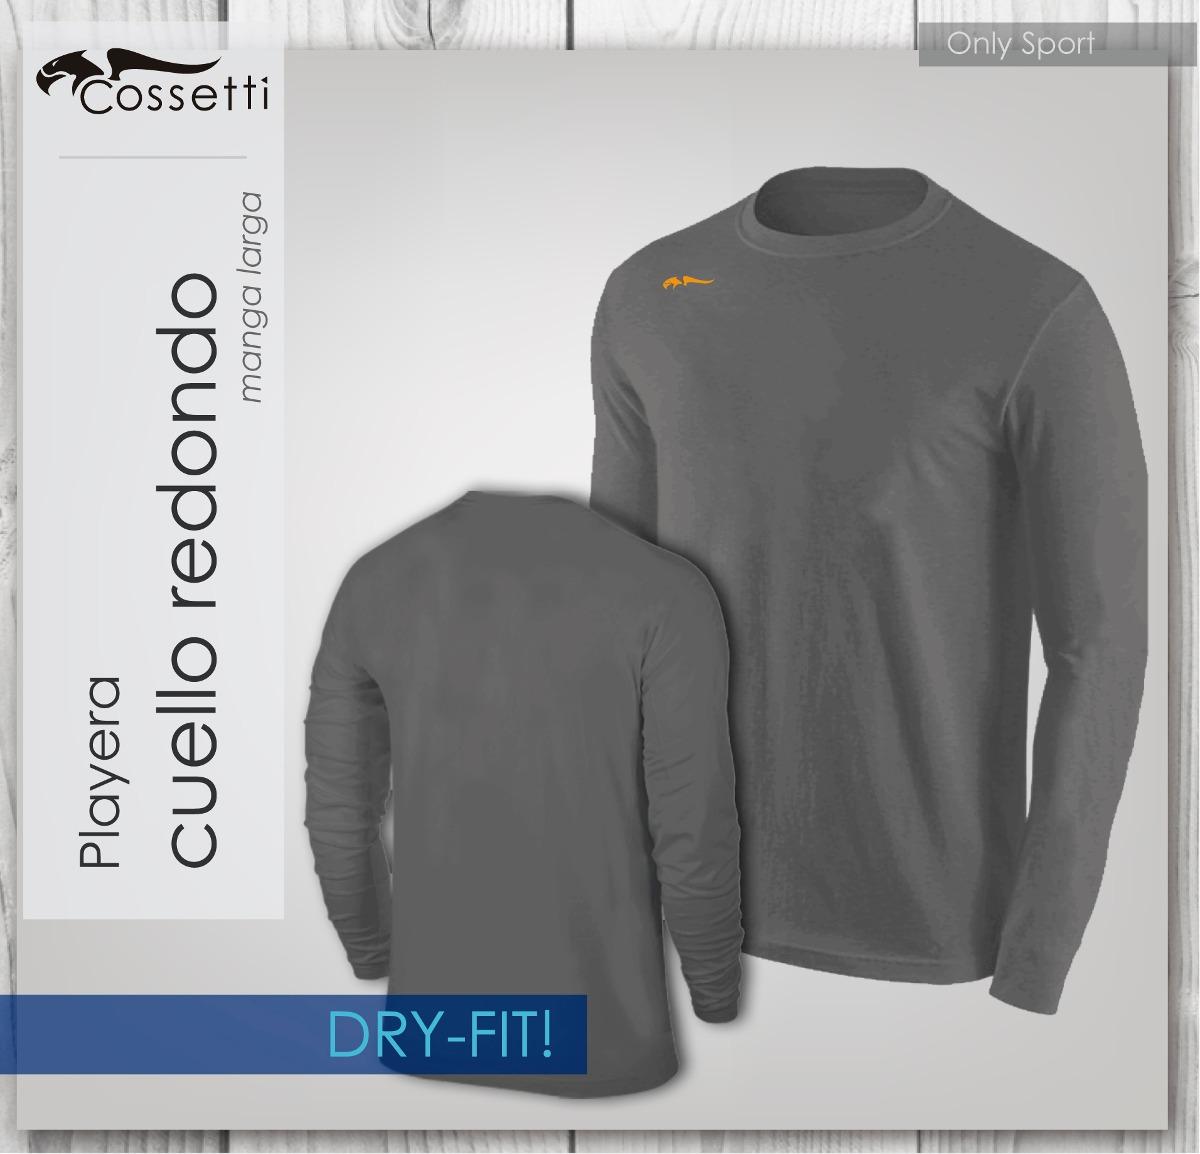 Playera Cuello Redondo Manga Larga Dry-fit! Cossetti -   270.00 en ... 55c222cc07591